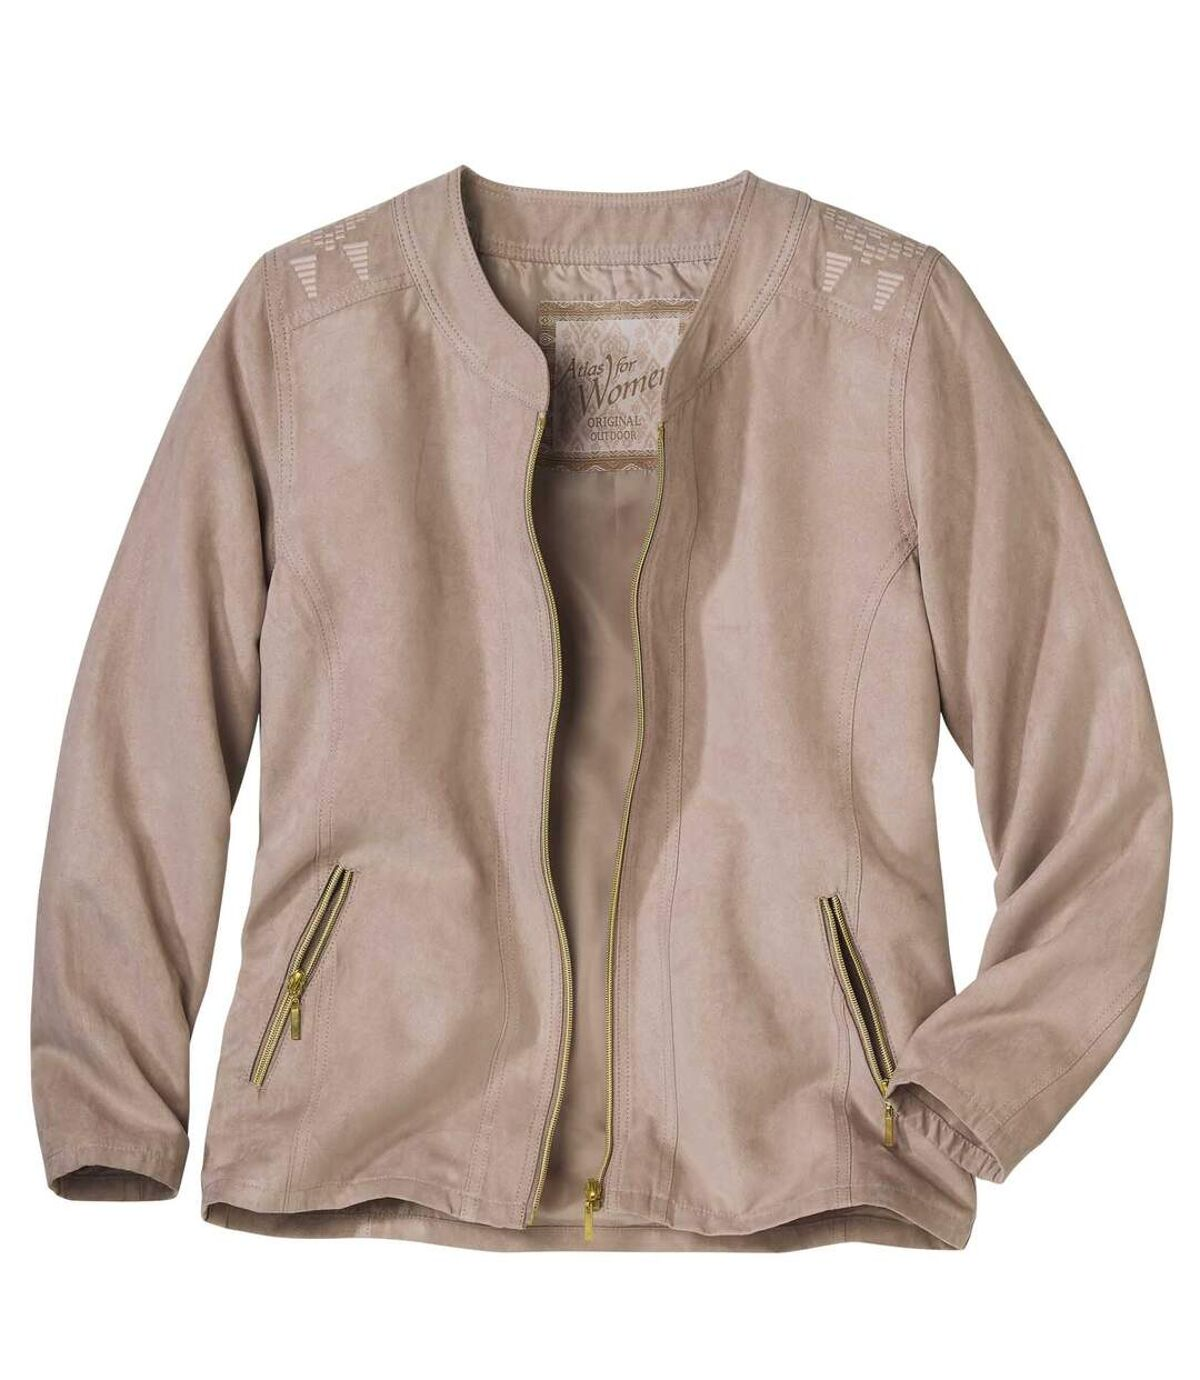 Women's Powder Pink Zip Up Jacket - Faux Suede Atlas For Men